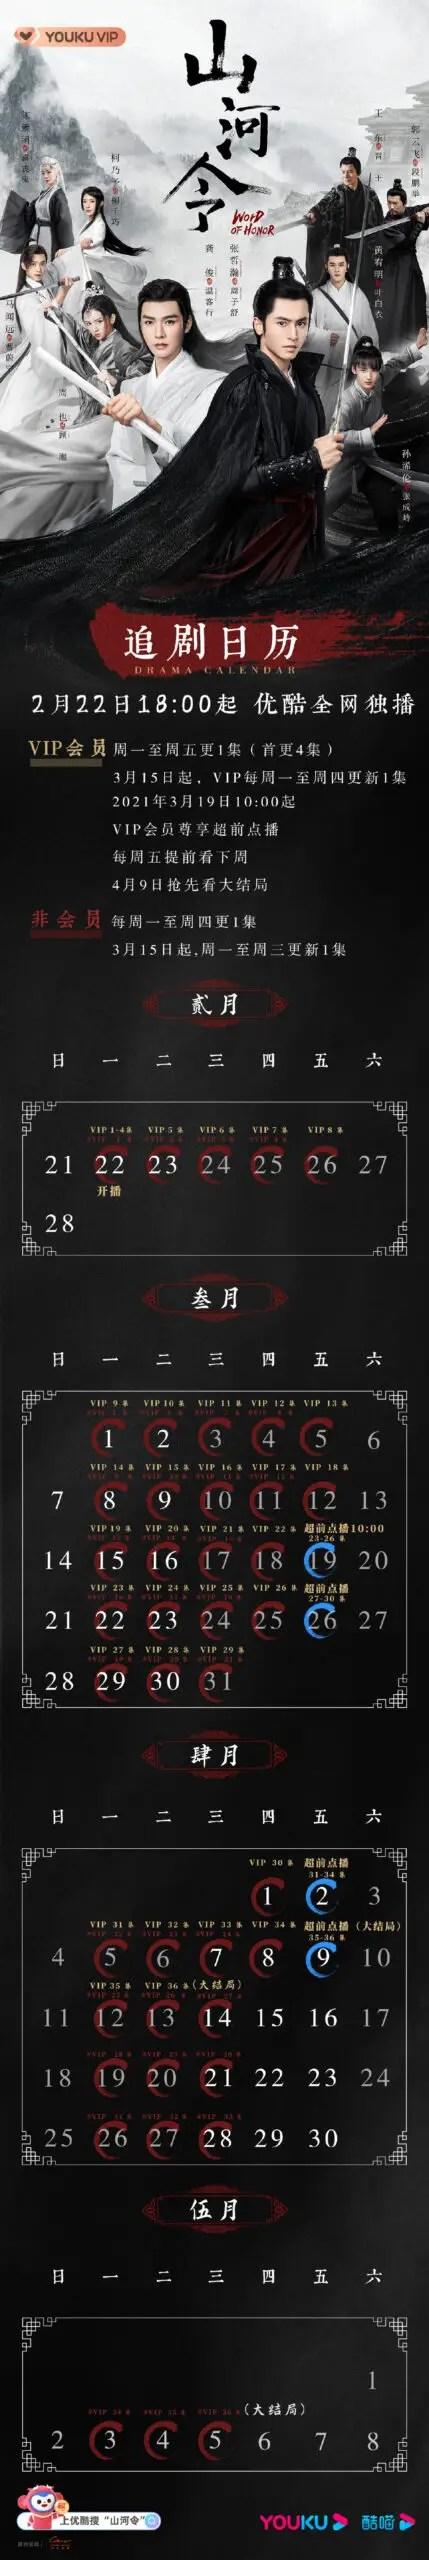 Word Of Honor Chinese Drama Airing Calendar 1